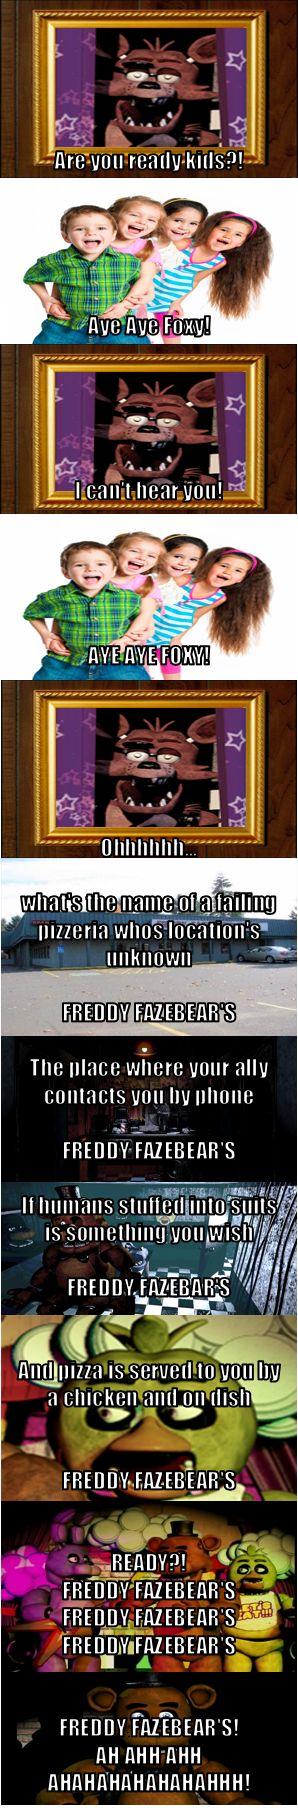 Spongebob theme FNAF Version by onyxcarmine.deviantart.com on @DeviantArt